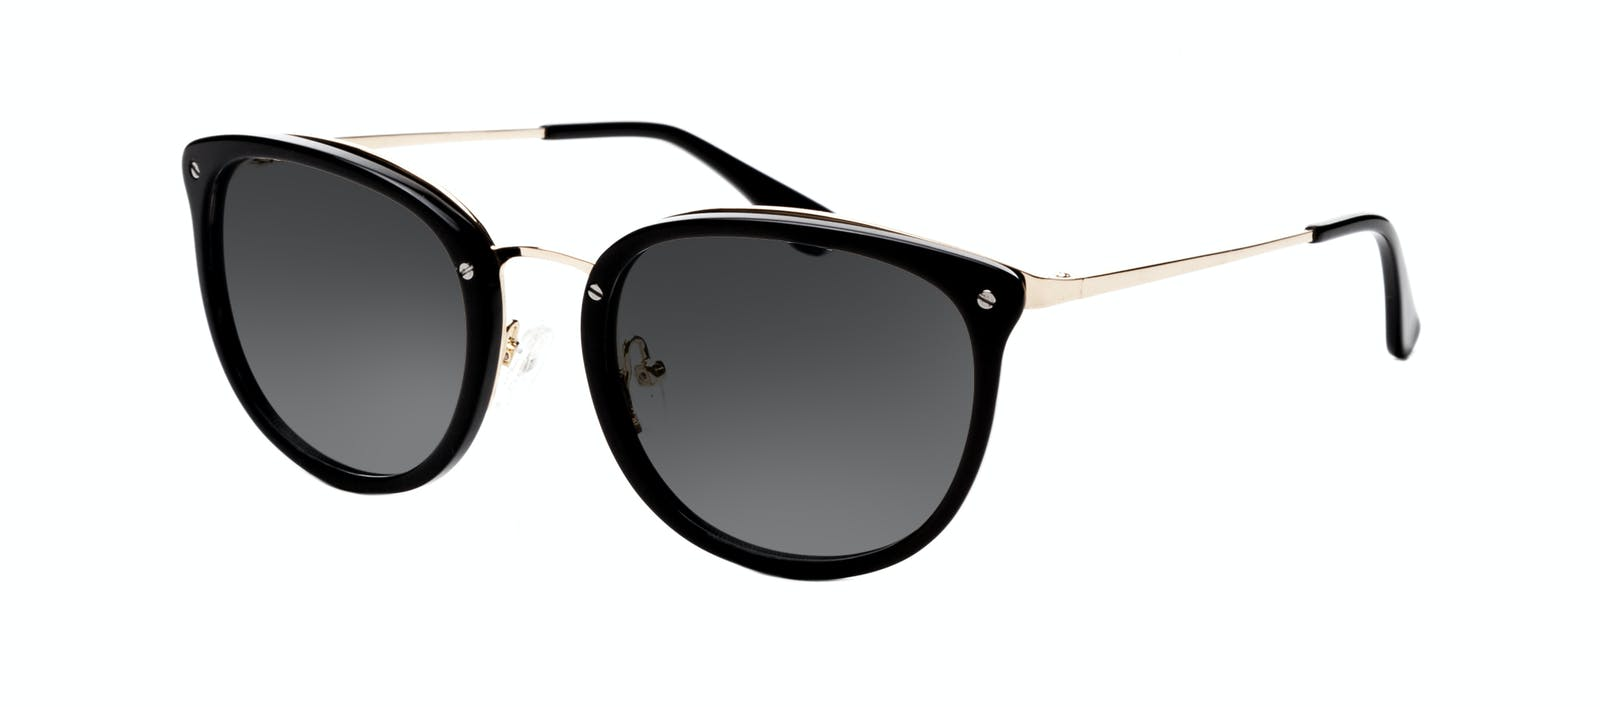 c55d3a9bf0 Affordable Fashion Glasses Square Round Sunglasses Women Amaze Onyx Tilt